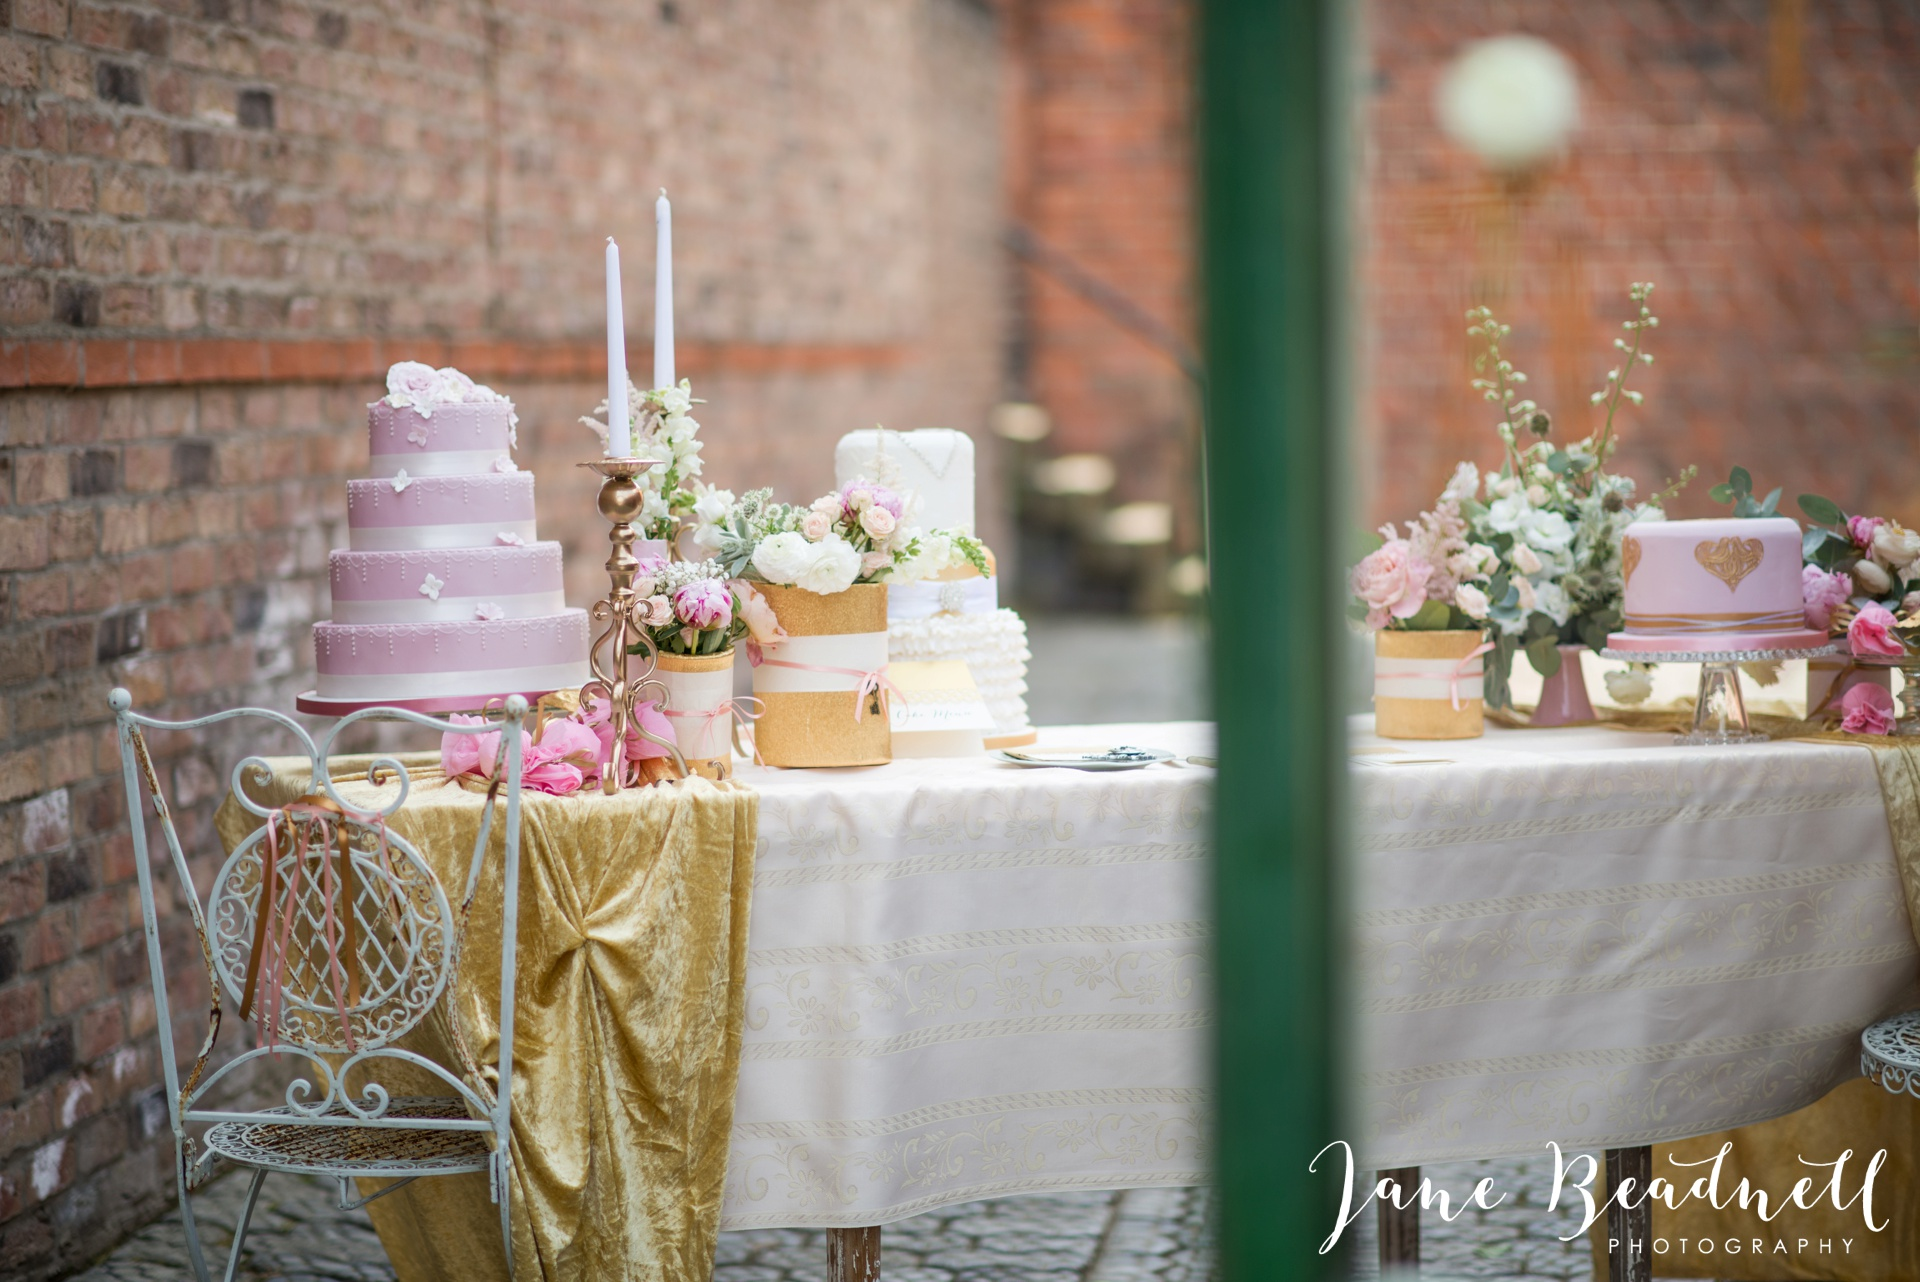 Jane Beadnell fine art wedding photographer York Bridal Photo Shoot_0017